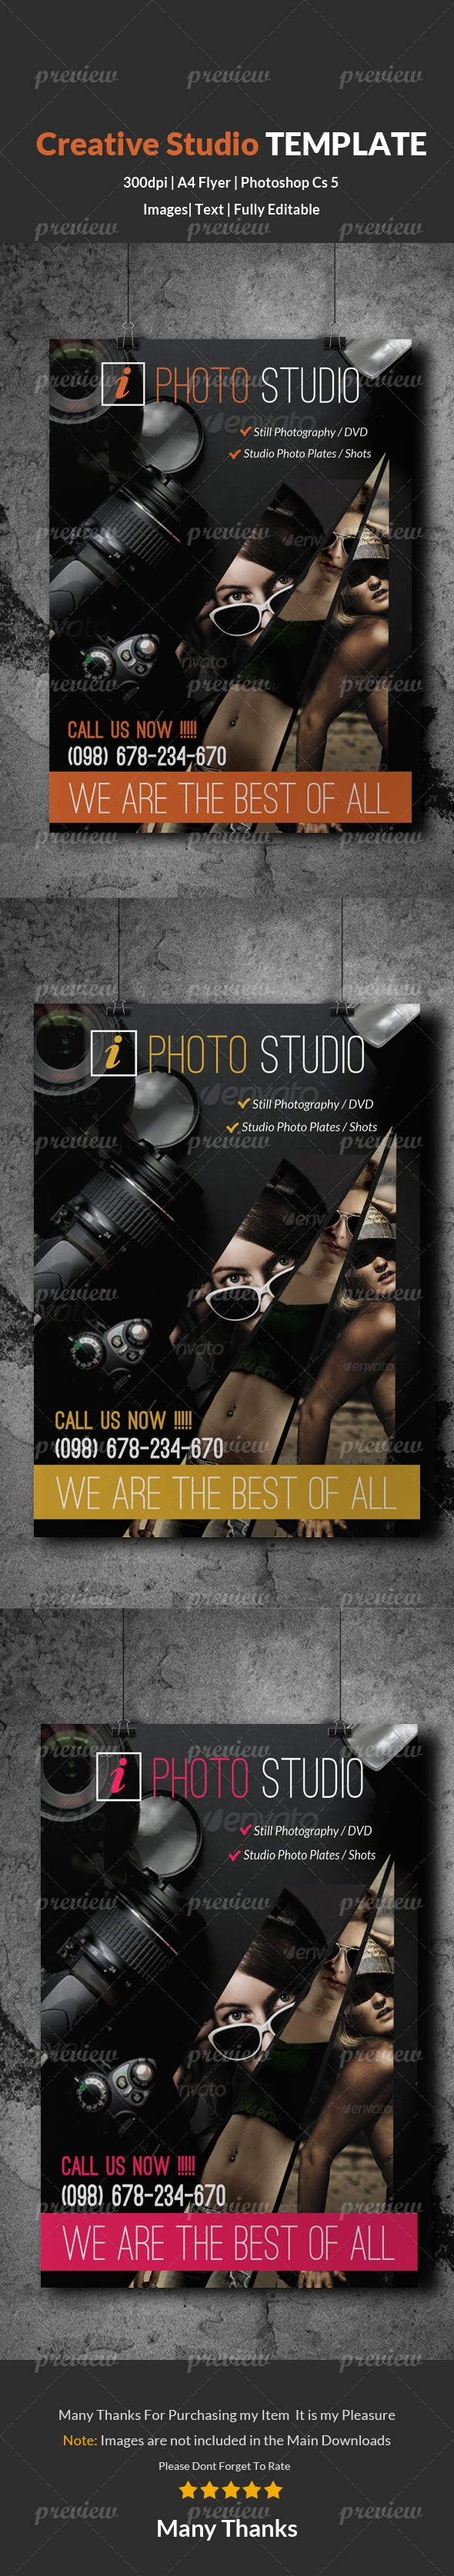 Photography & Photo Studio Flyer Template